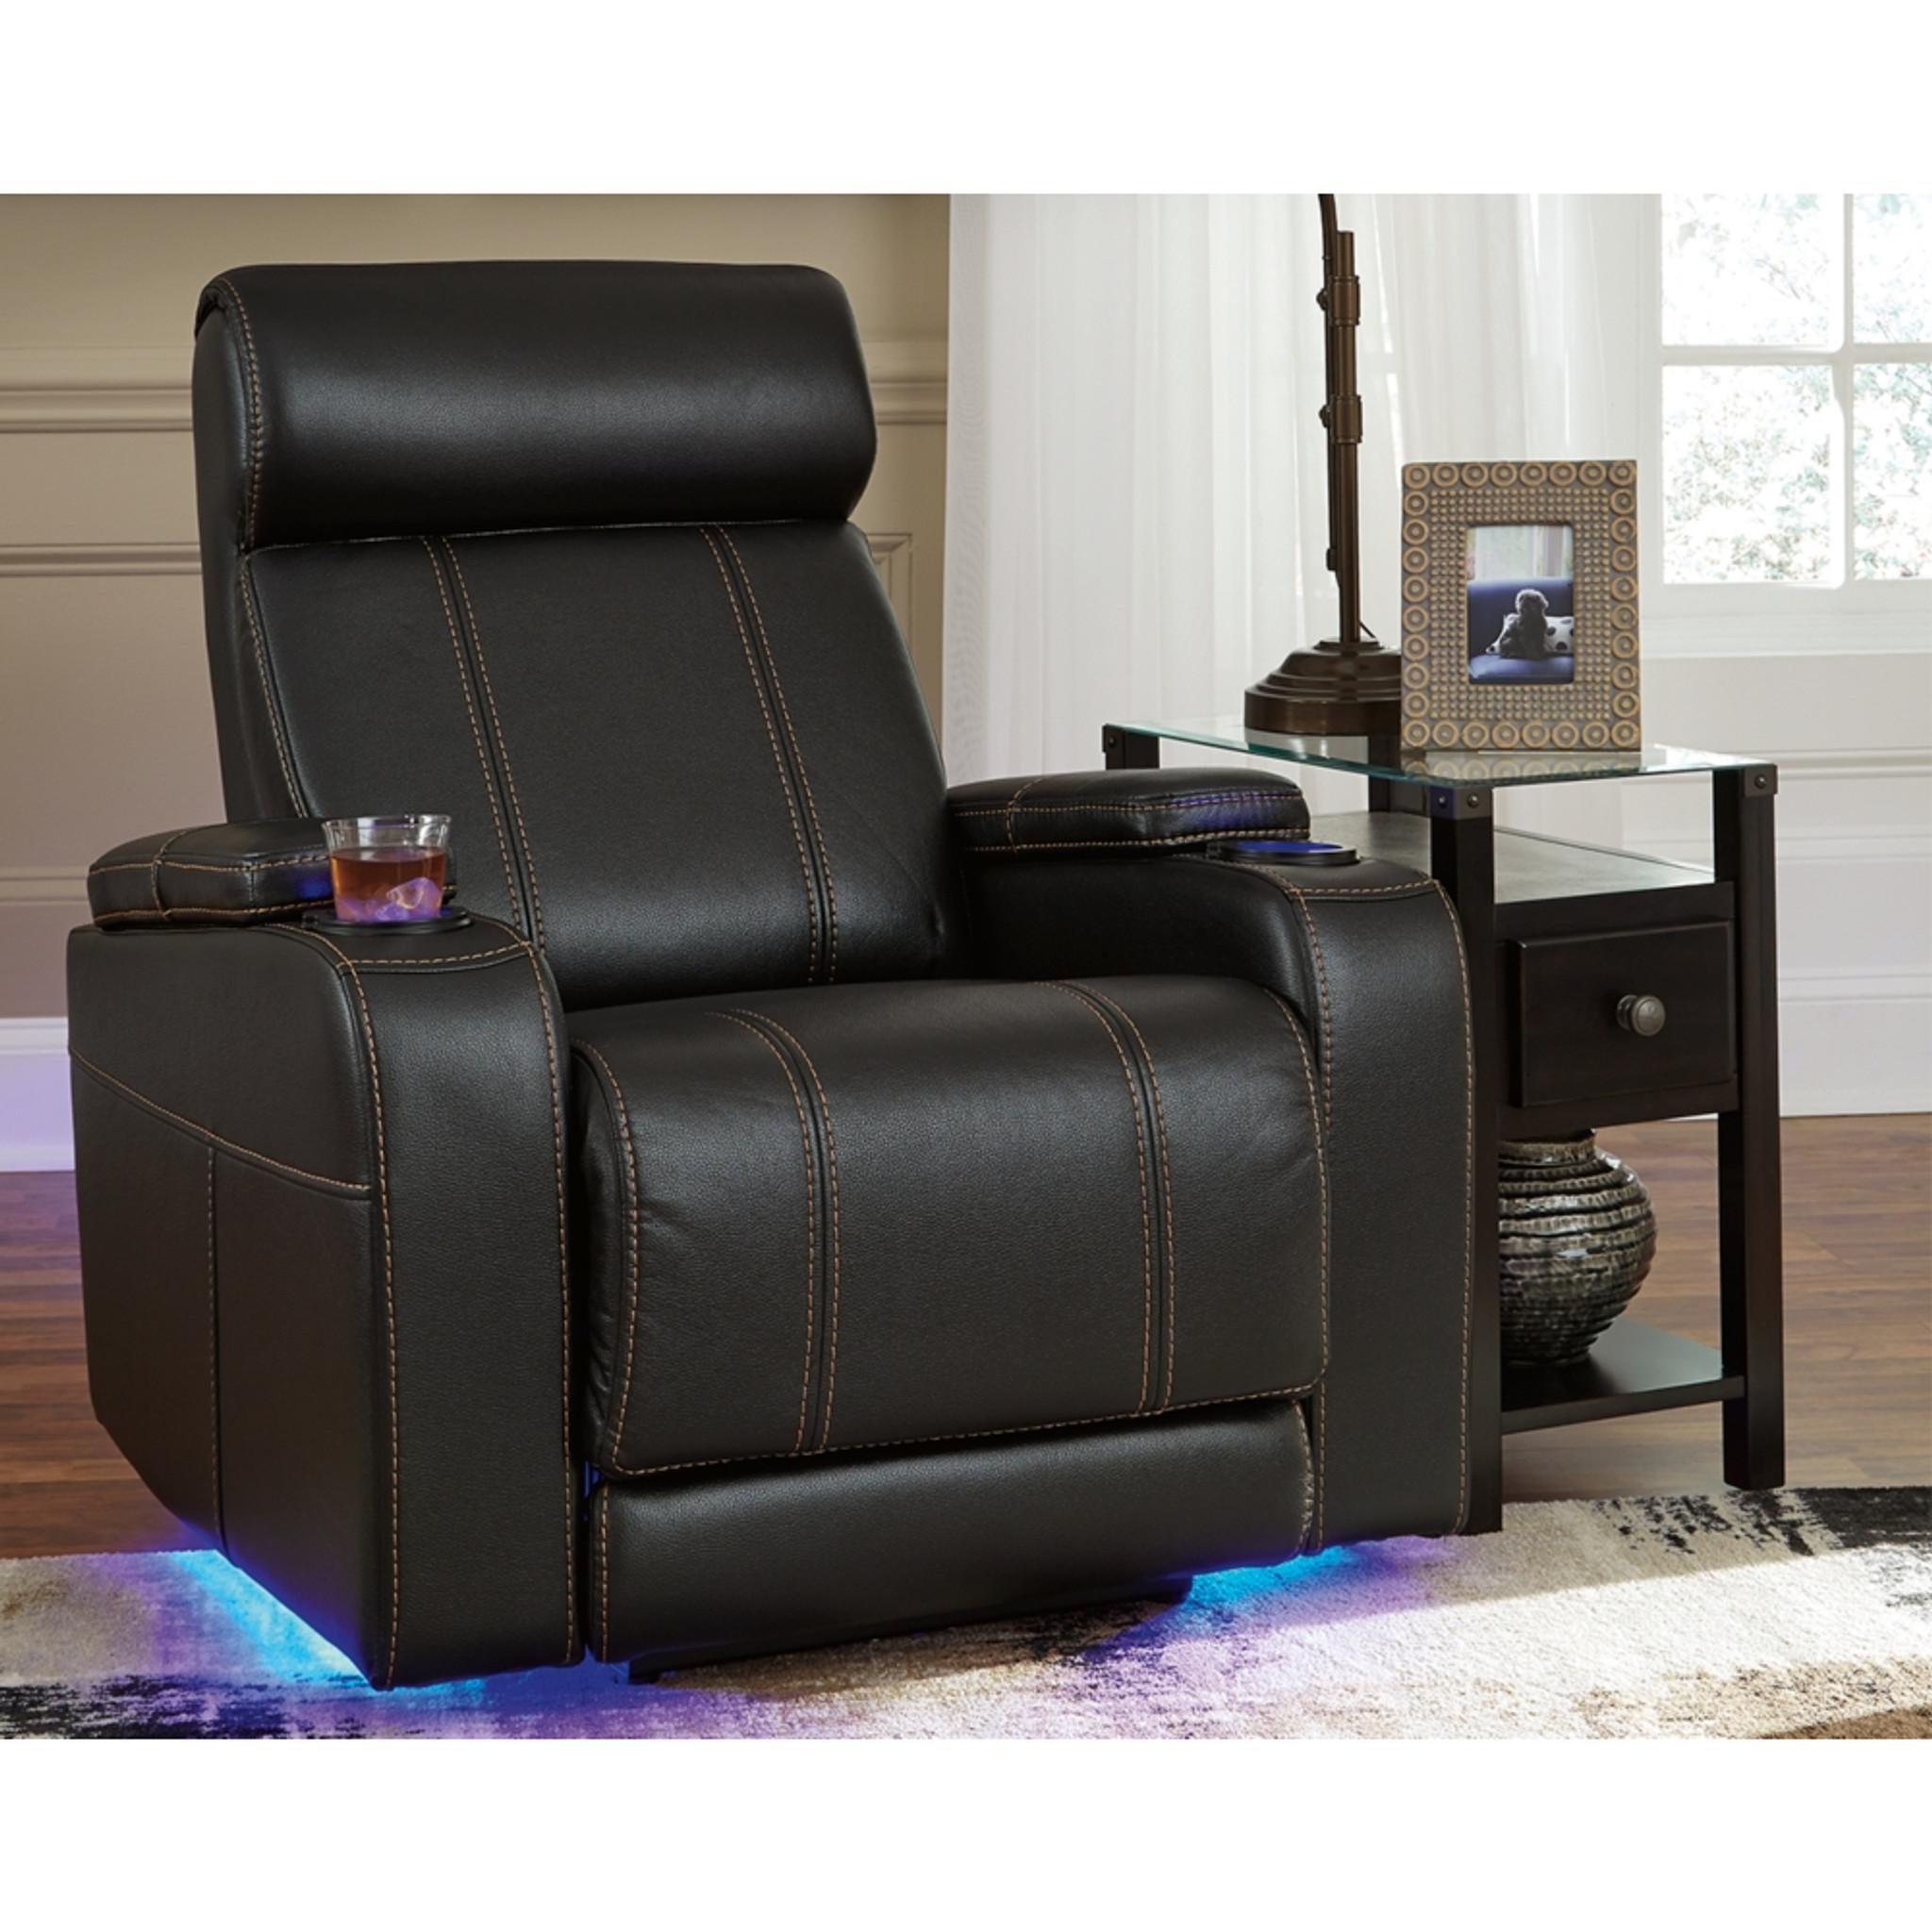 Stupendous Boyband Black Power Recliner Machost Co Dining Chair Design Ideas Machostcouk